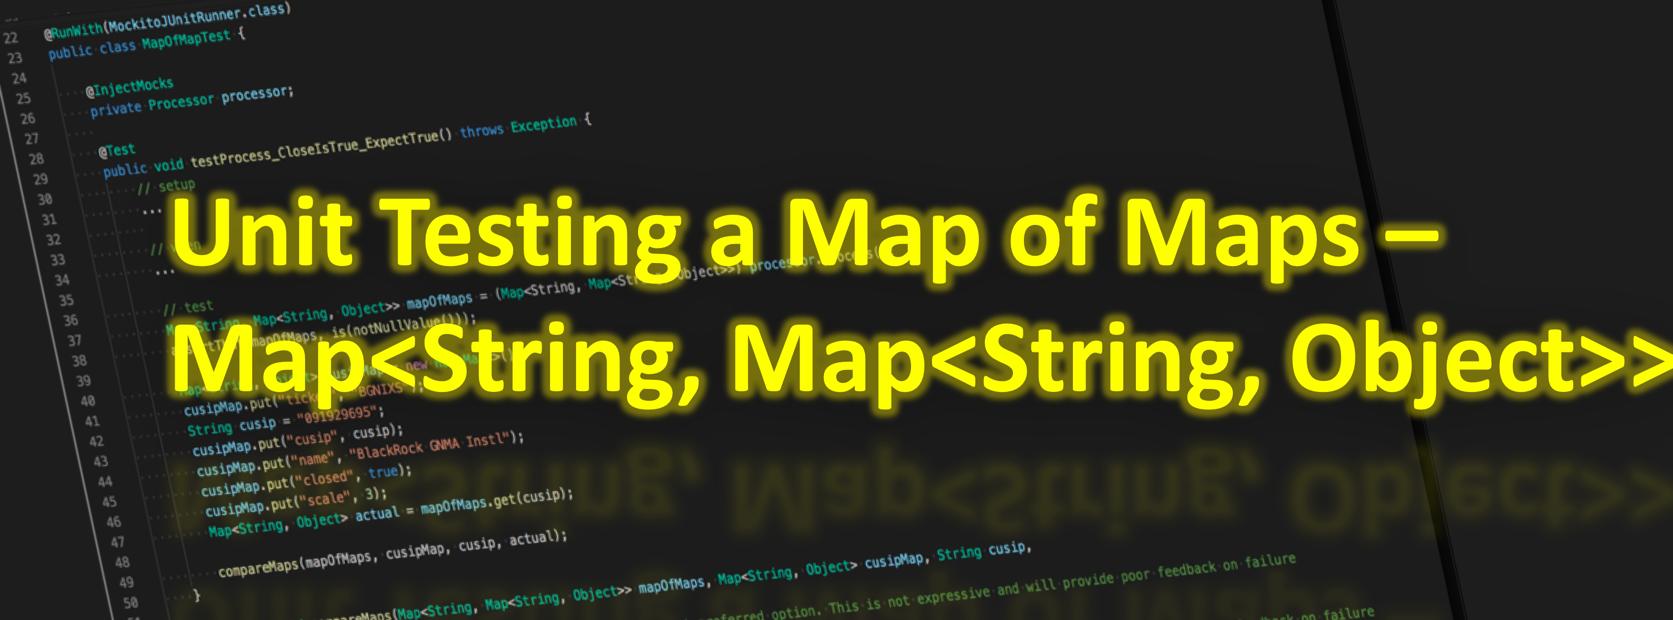 Map of Maps JUnit Test